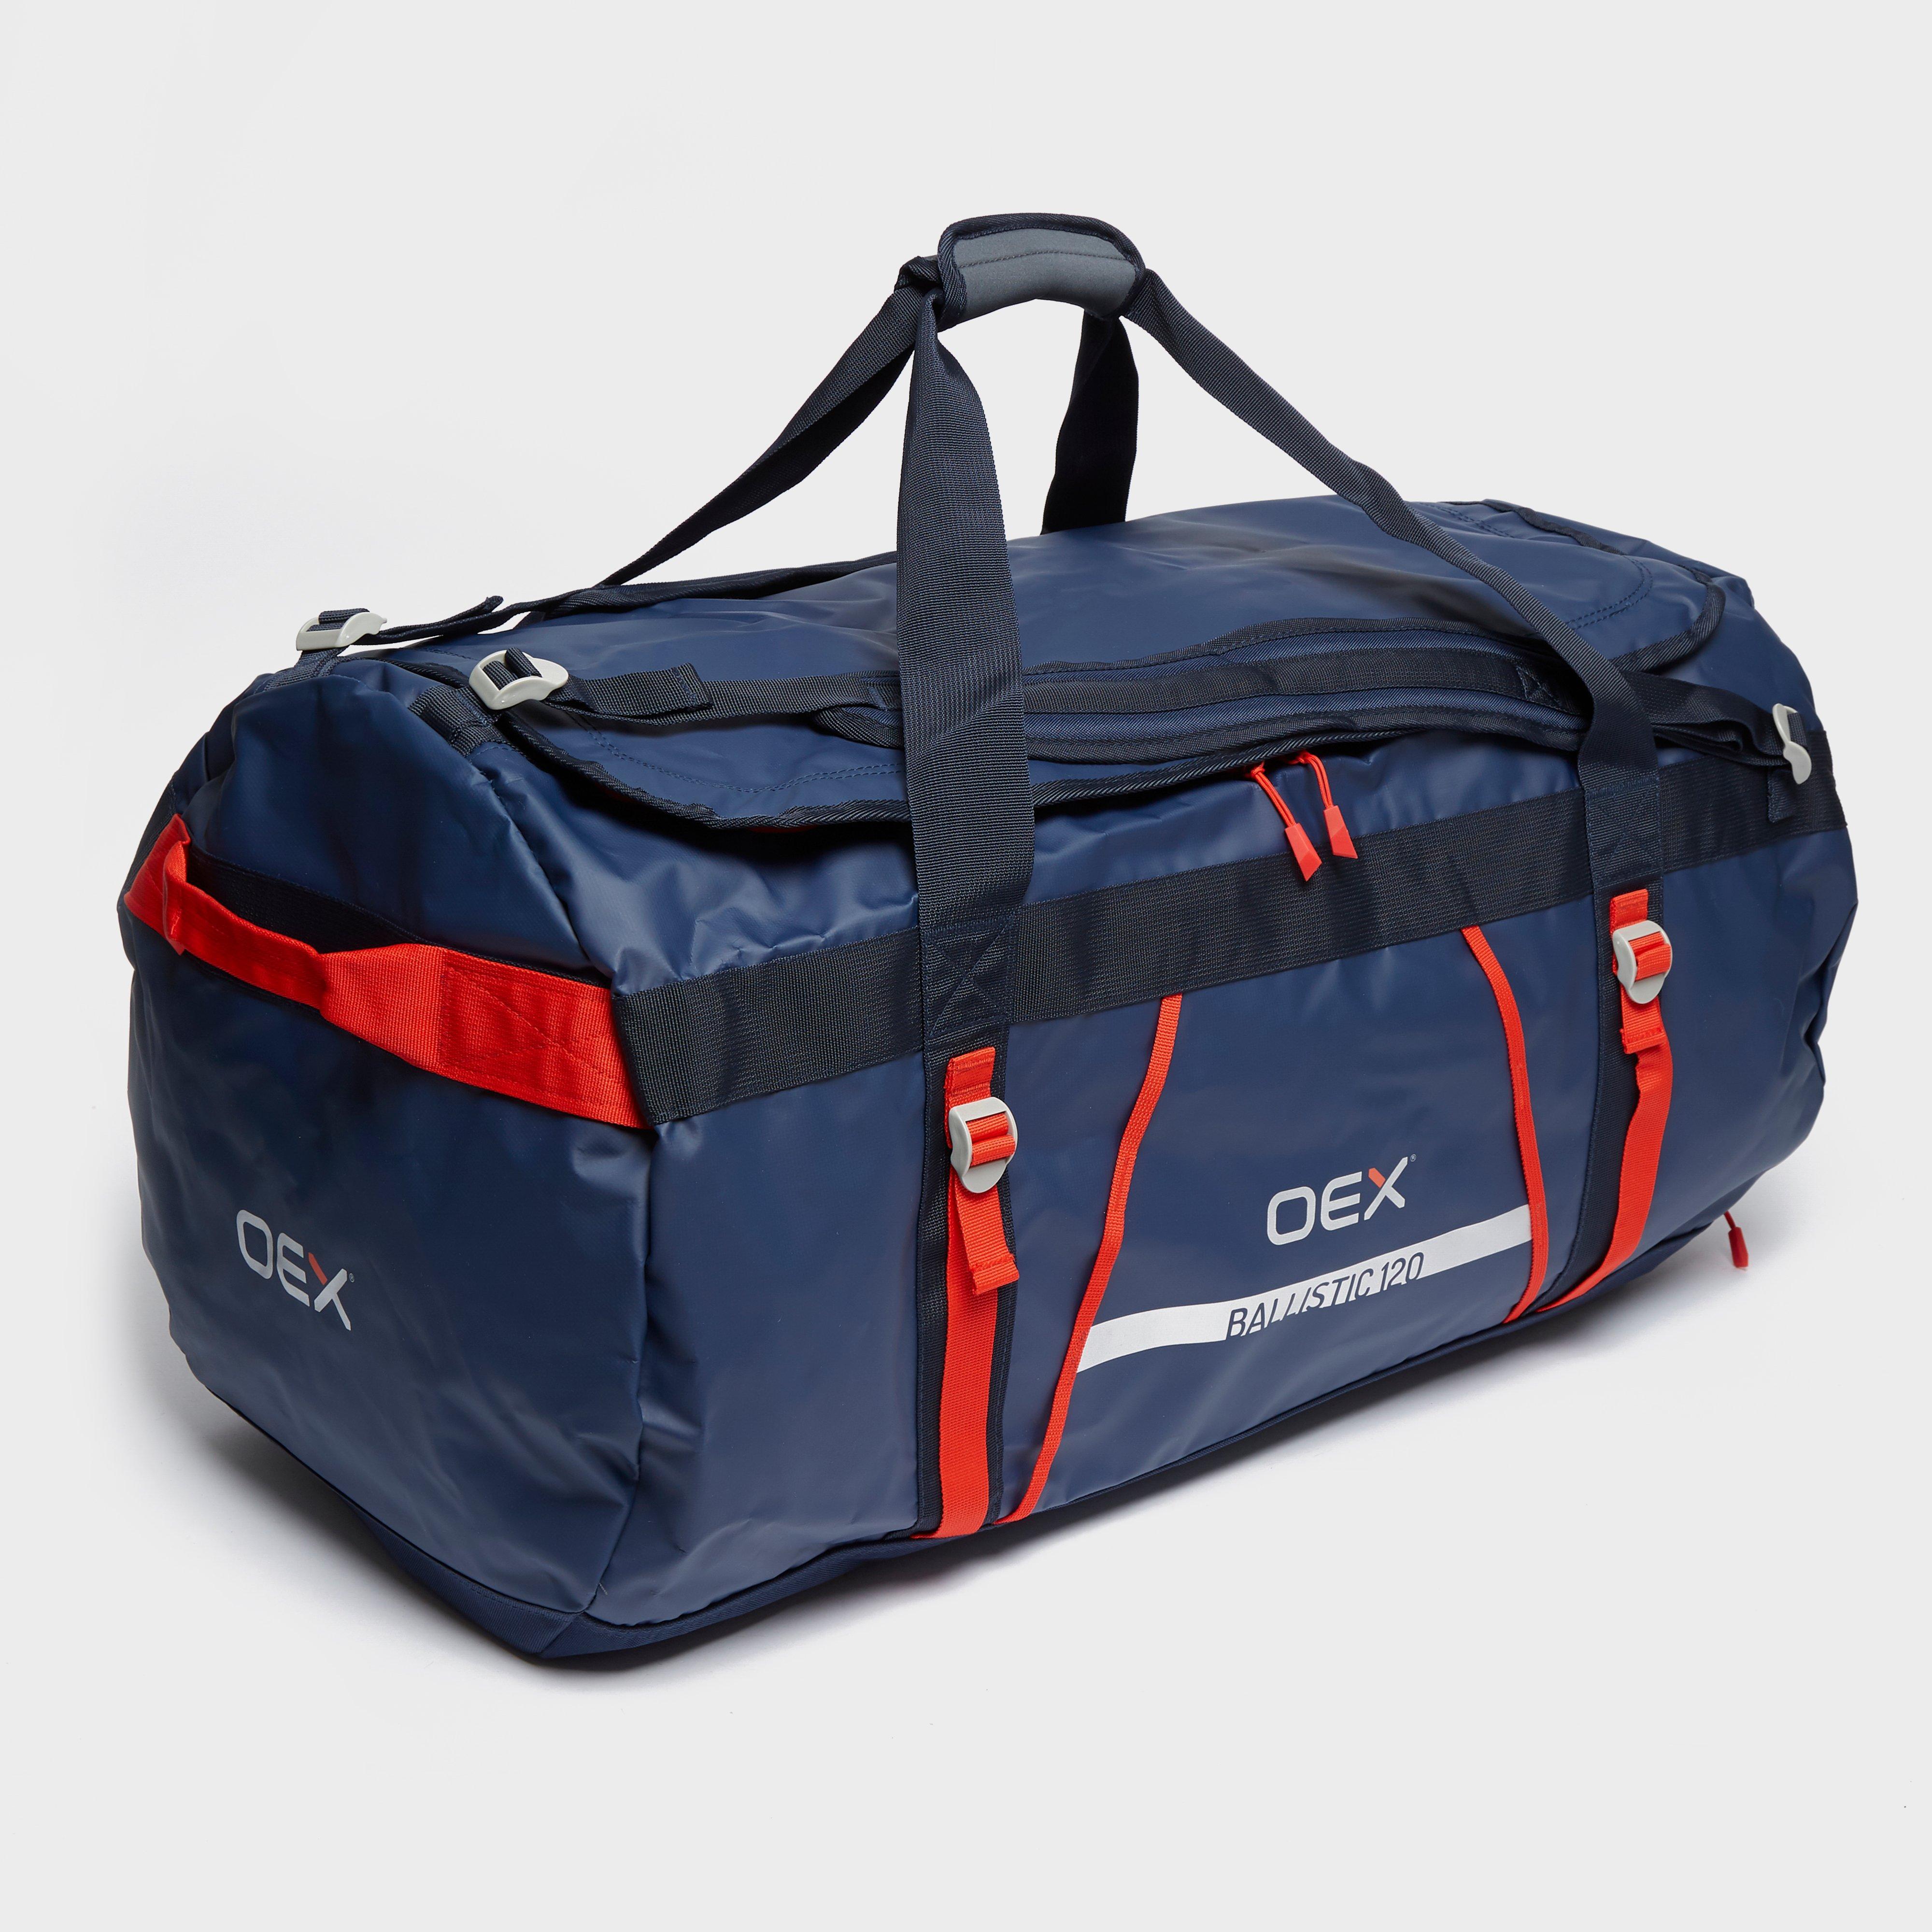 Oex Oex Ballistic 120L Cargo Bag - Blue, Blue